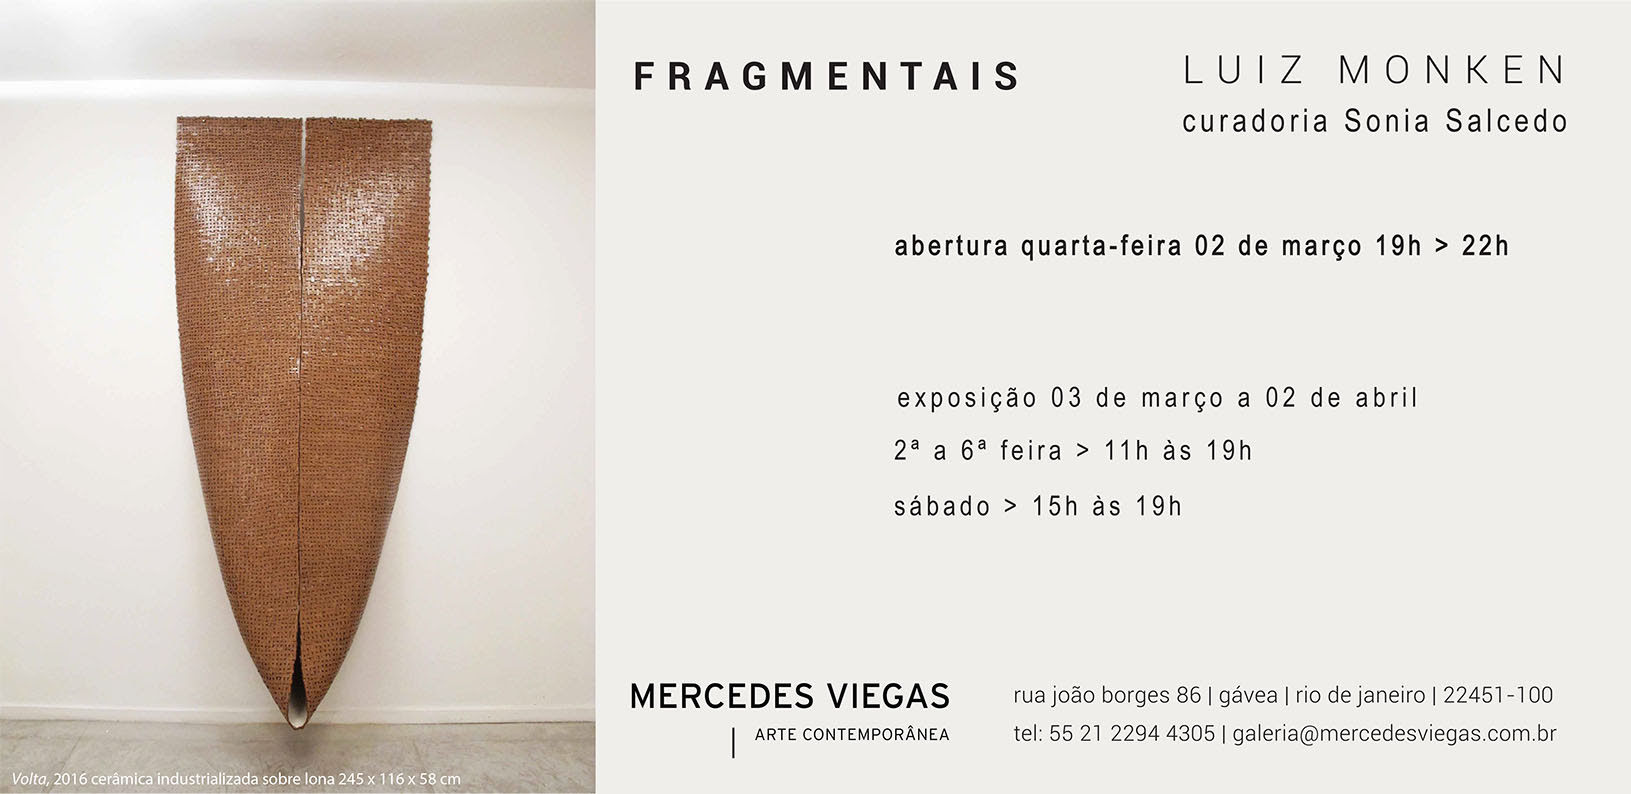 Mercedes Viegas Arte Contemporânea abre exposição de Luiz Monken